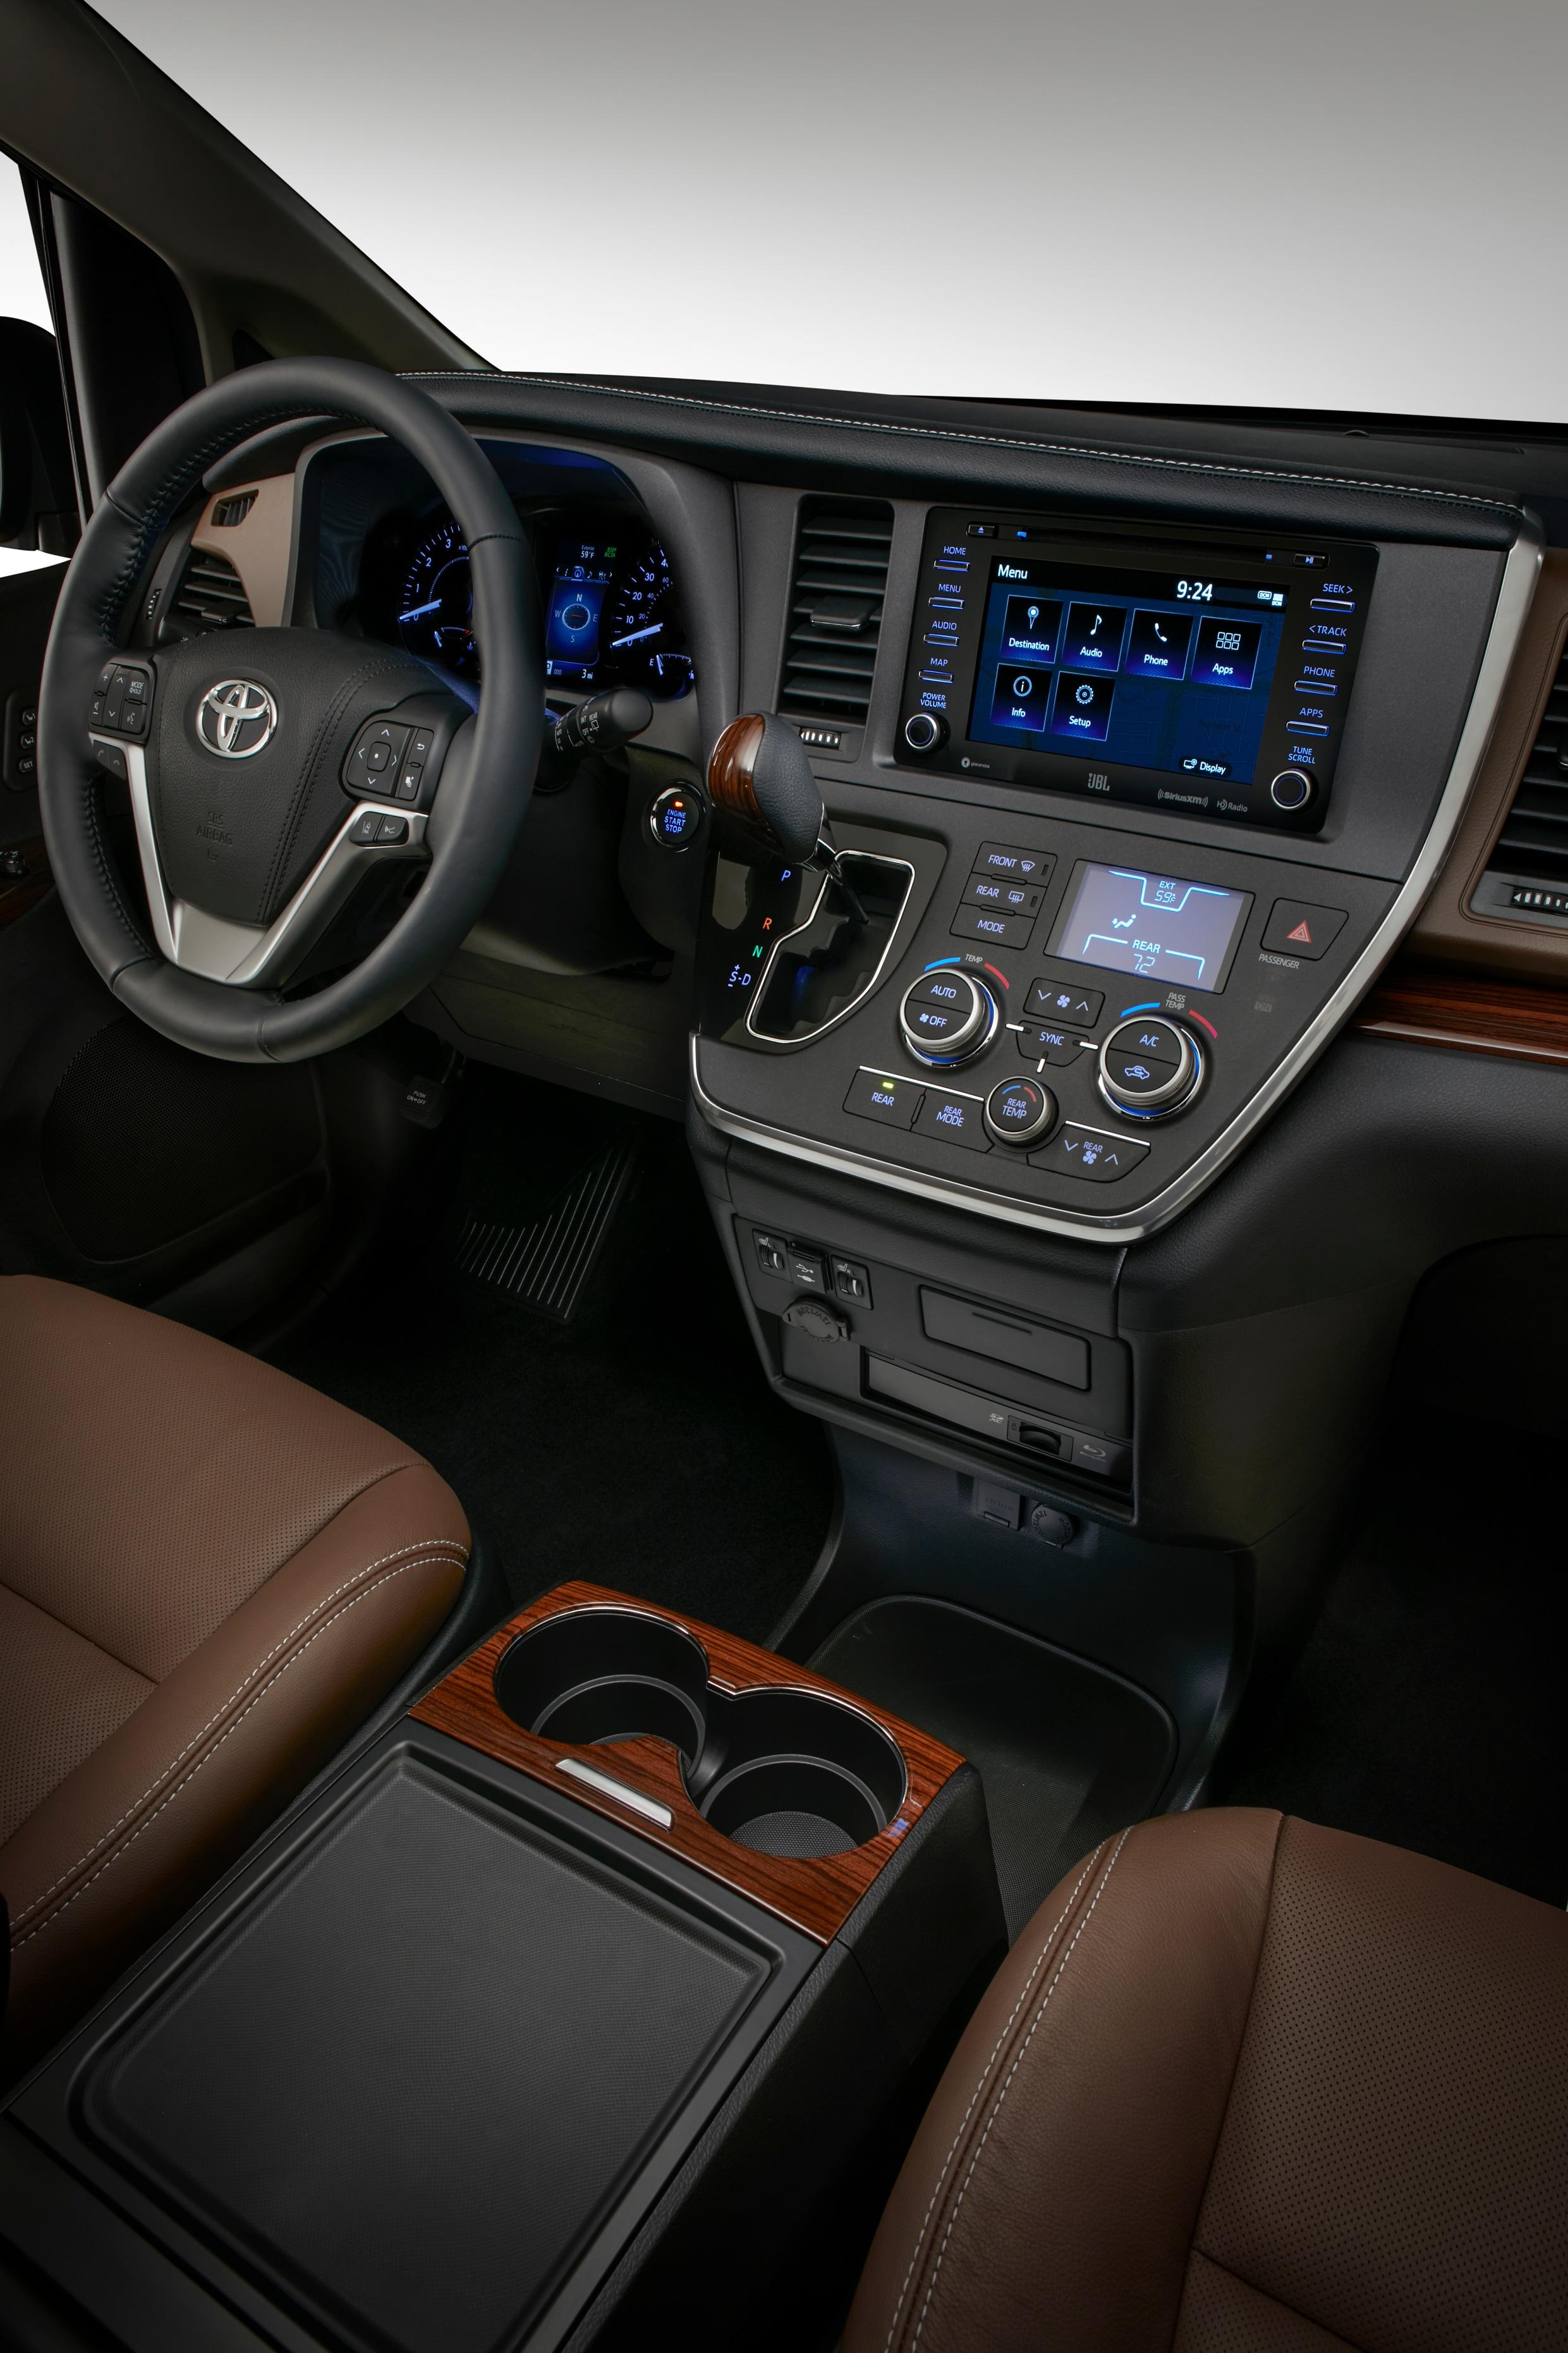 2018 Toyota Sienna interior photos